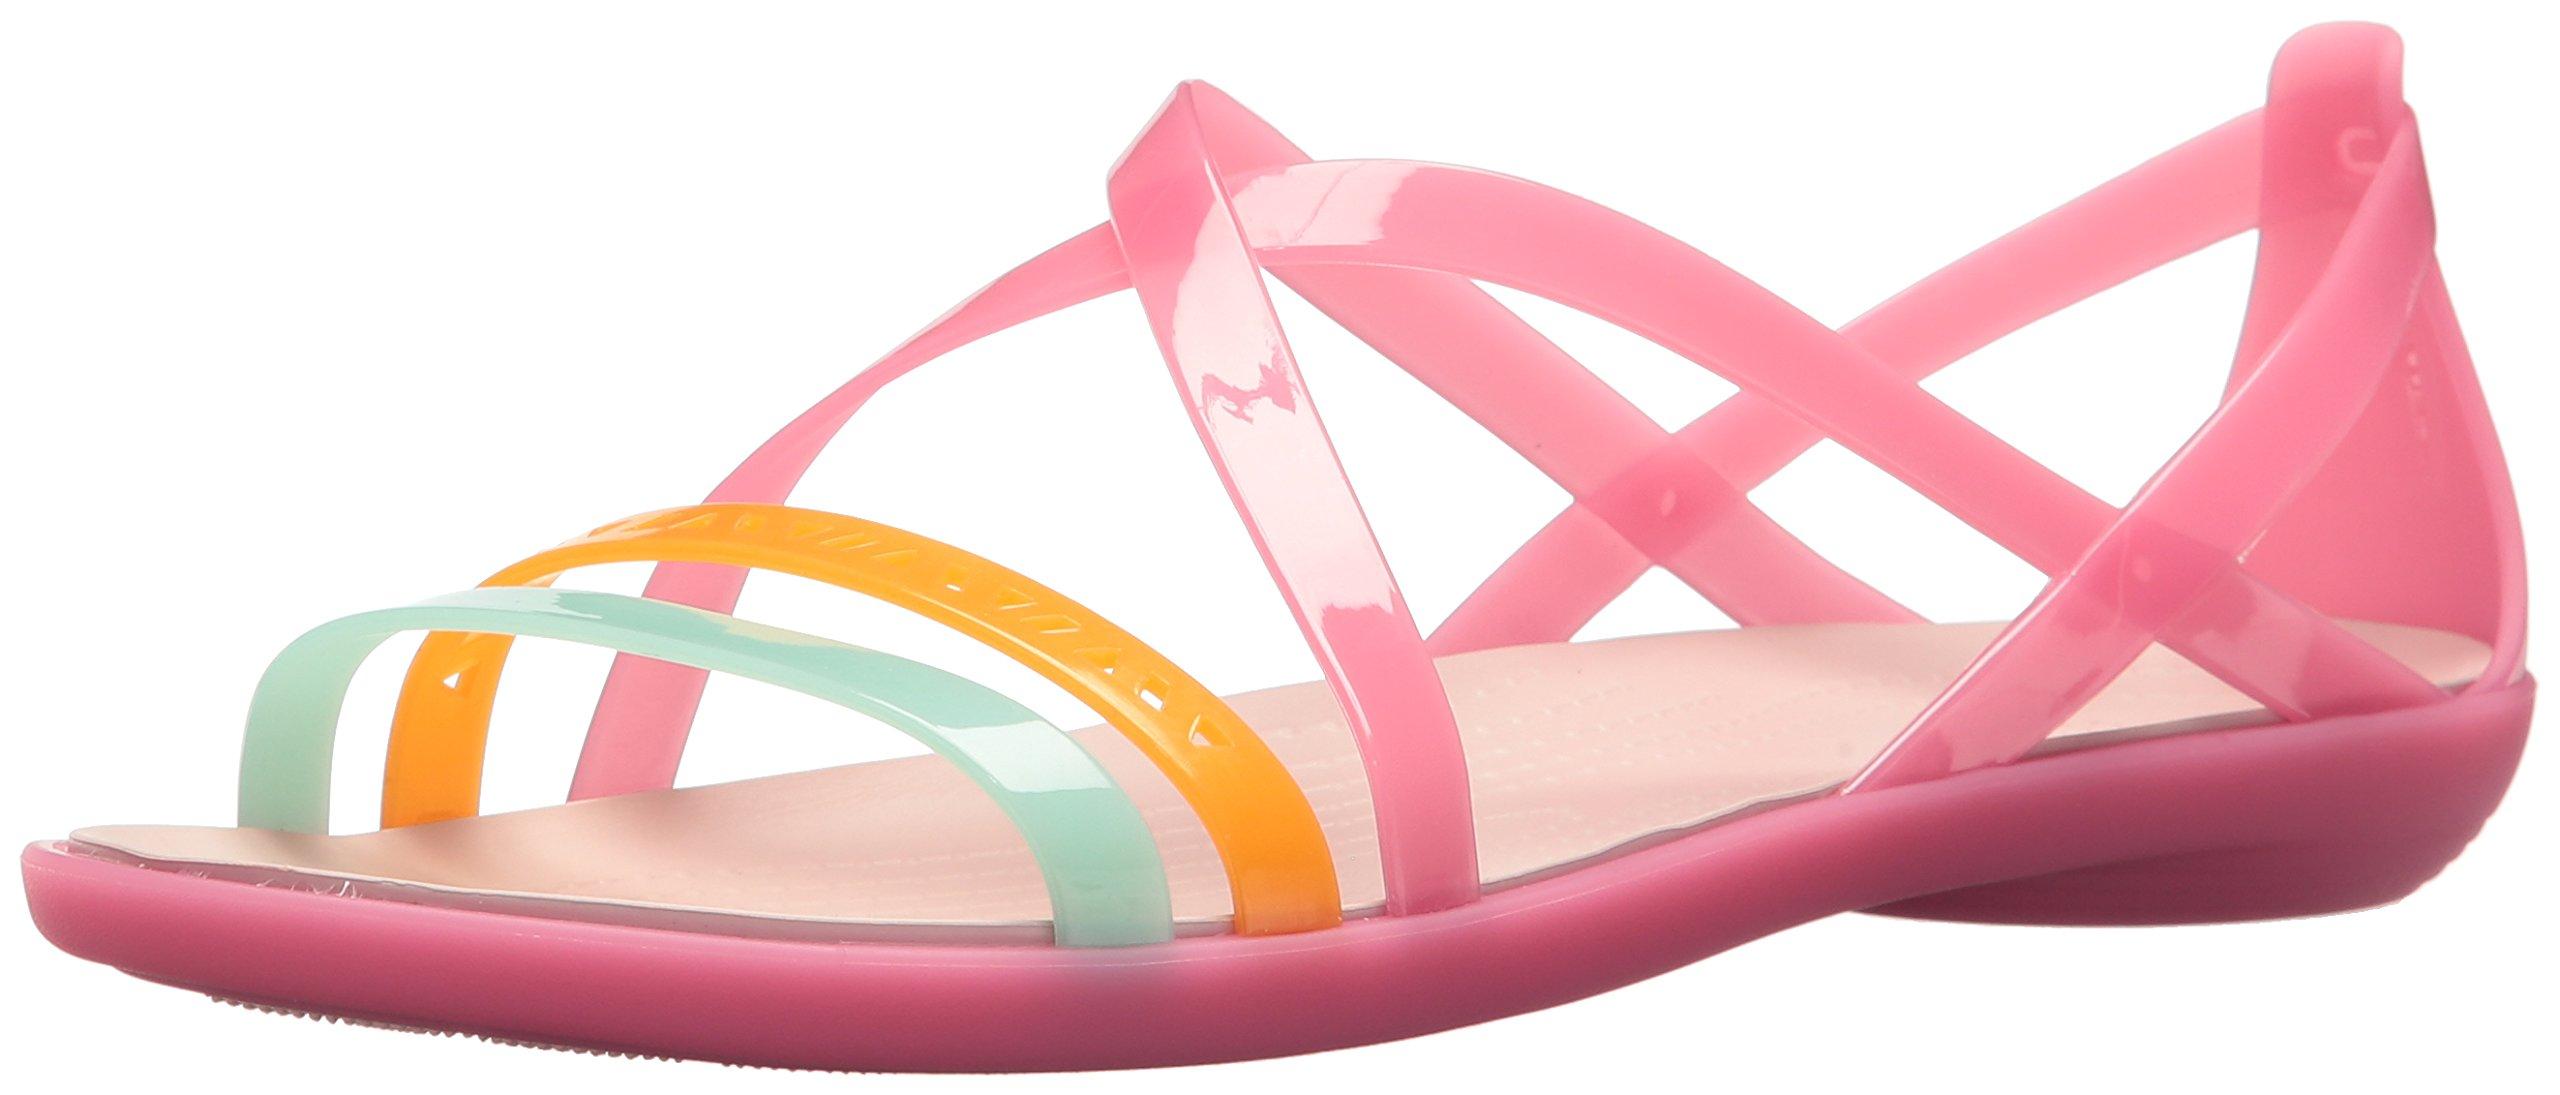 Crocs Women's Isabella Cut Strappy Sandal W Flat, Paradise Pink/Rose dust, 8 M US